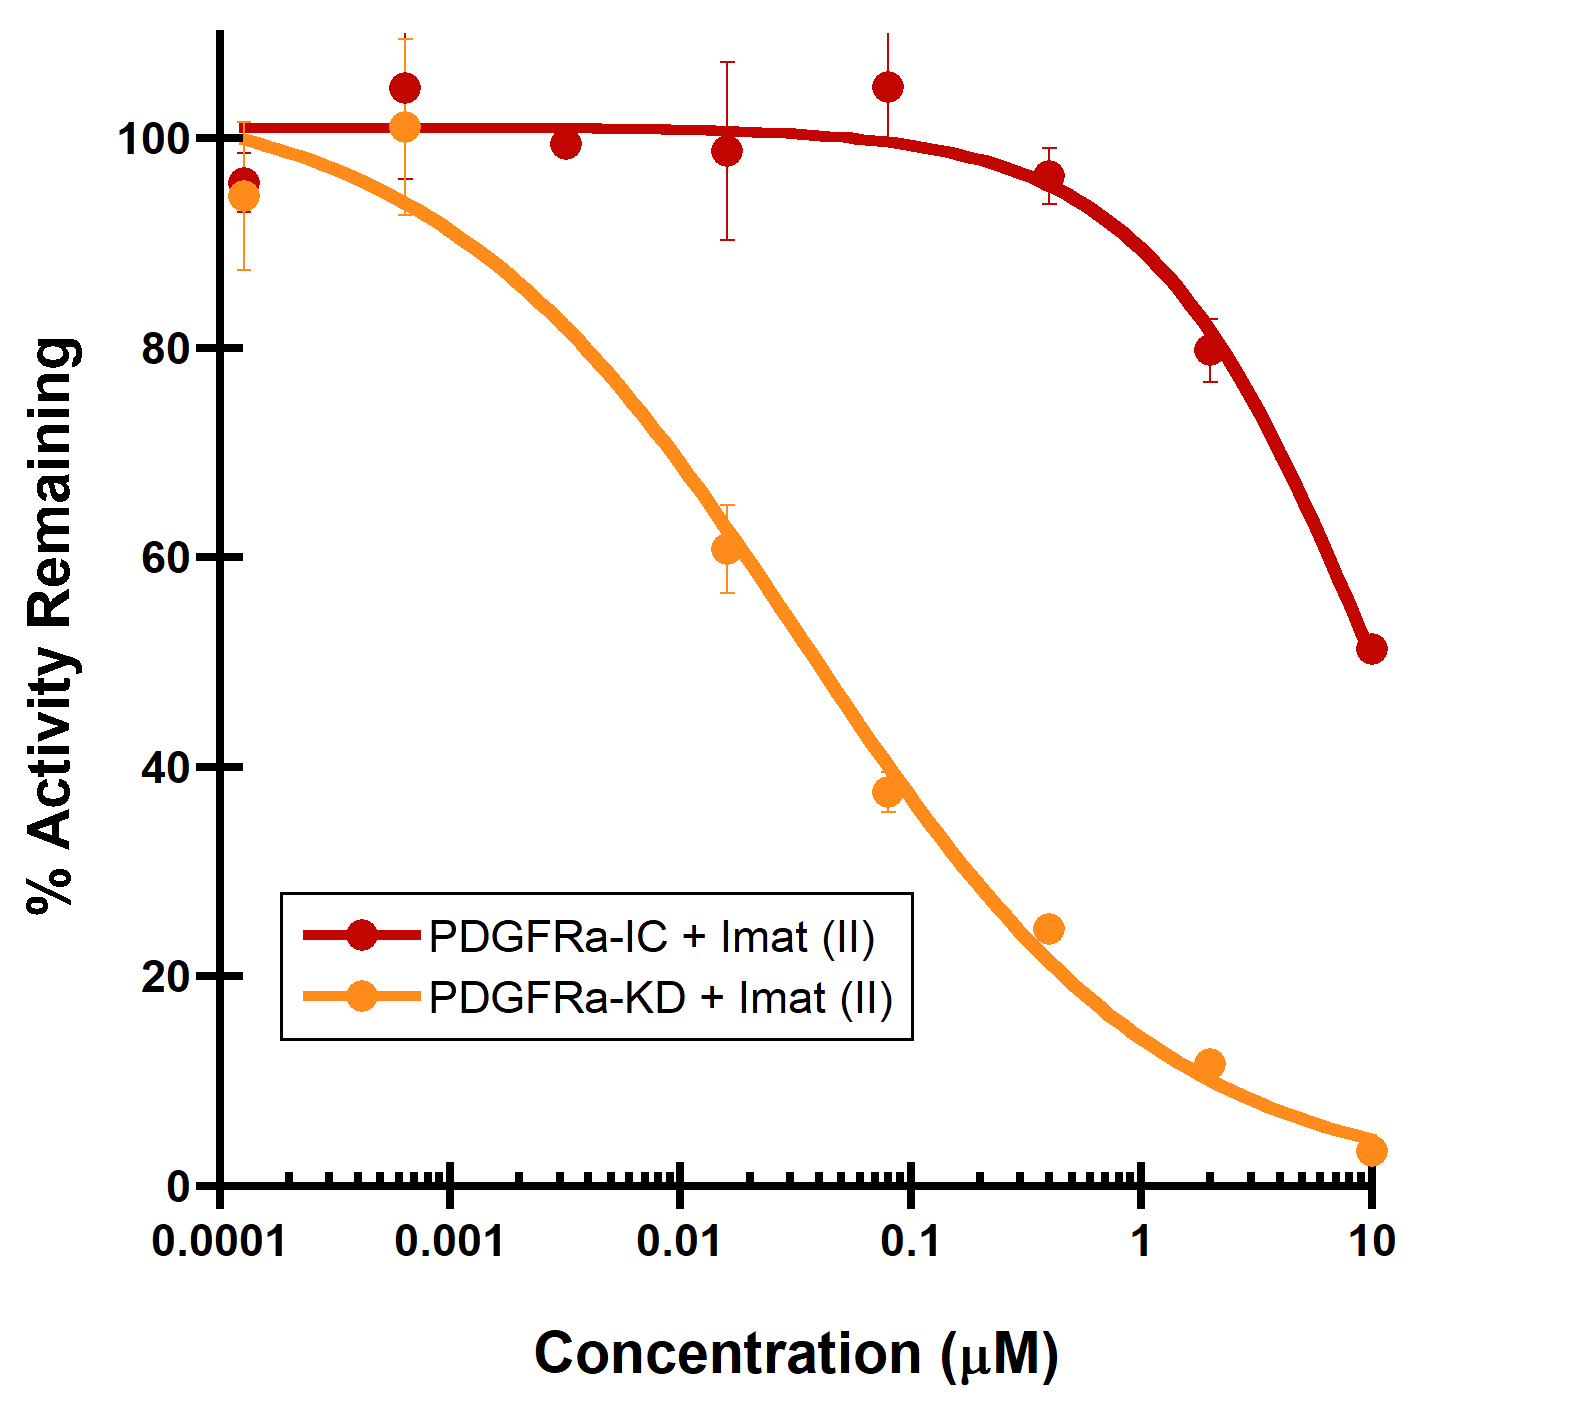 Type II inhibitor PDGFRA